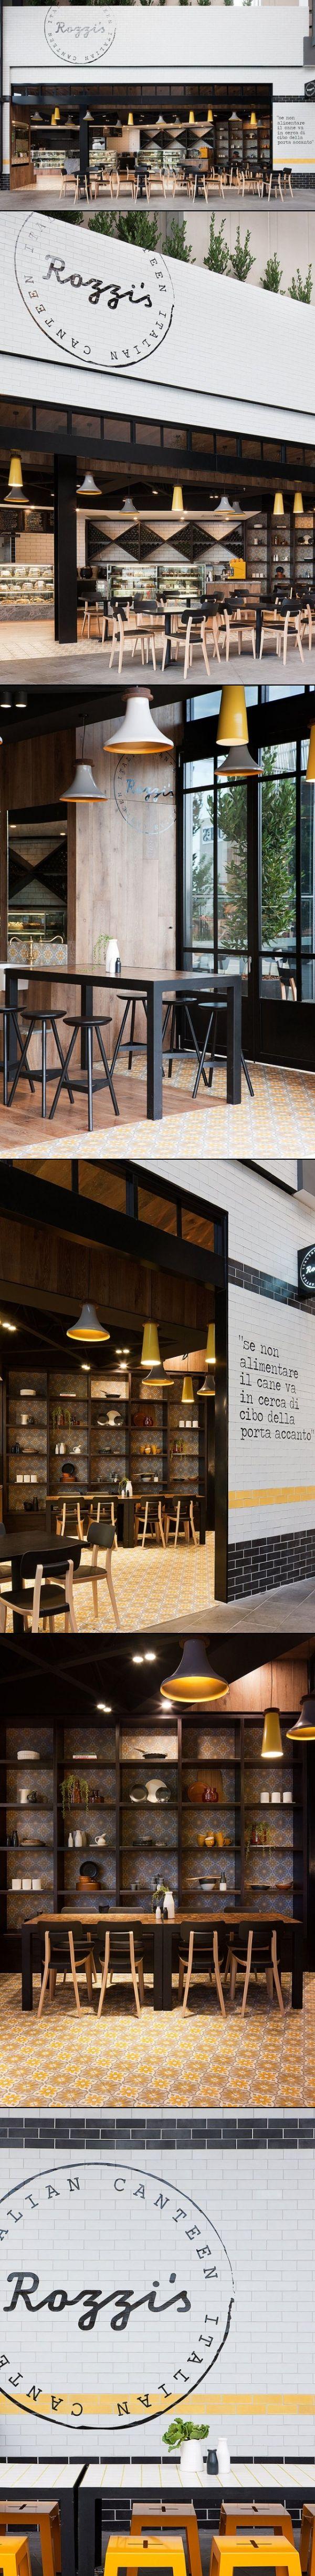 Rozzi's Italian Canteen | Melbourne | Mim Design